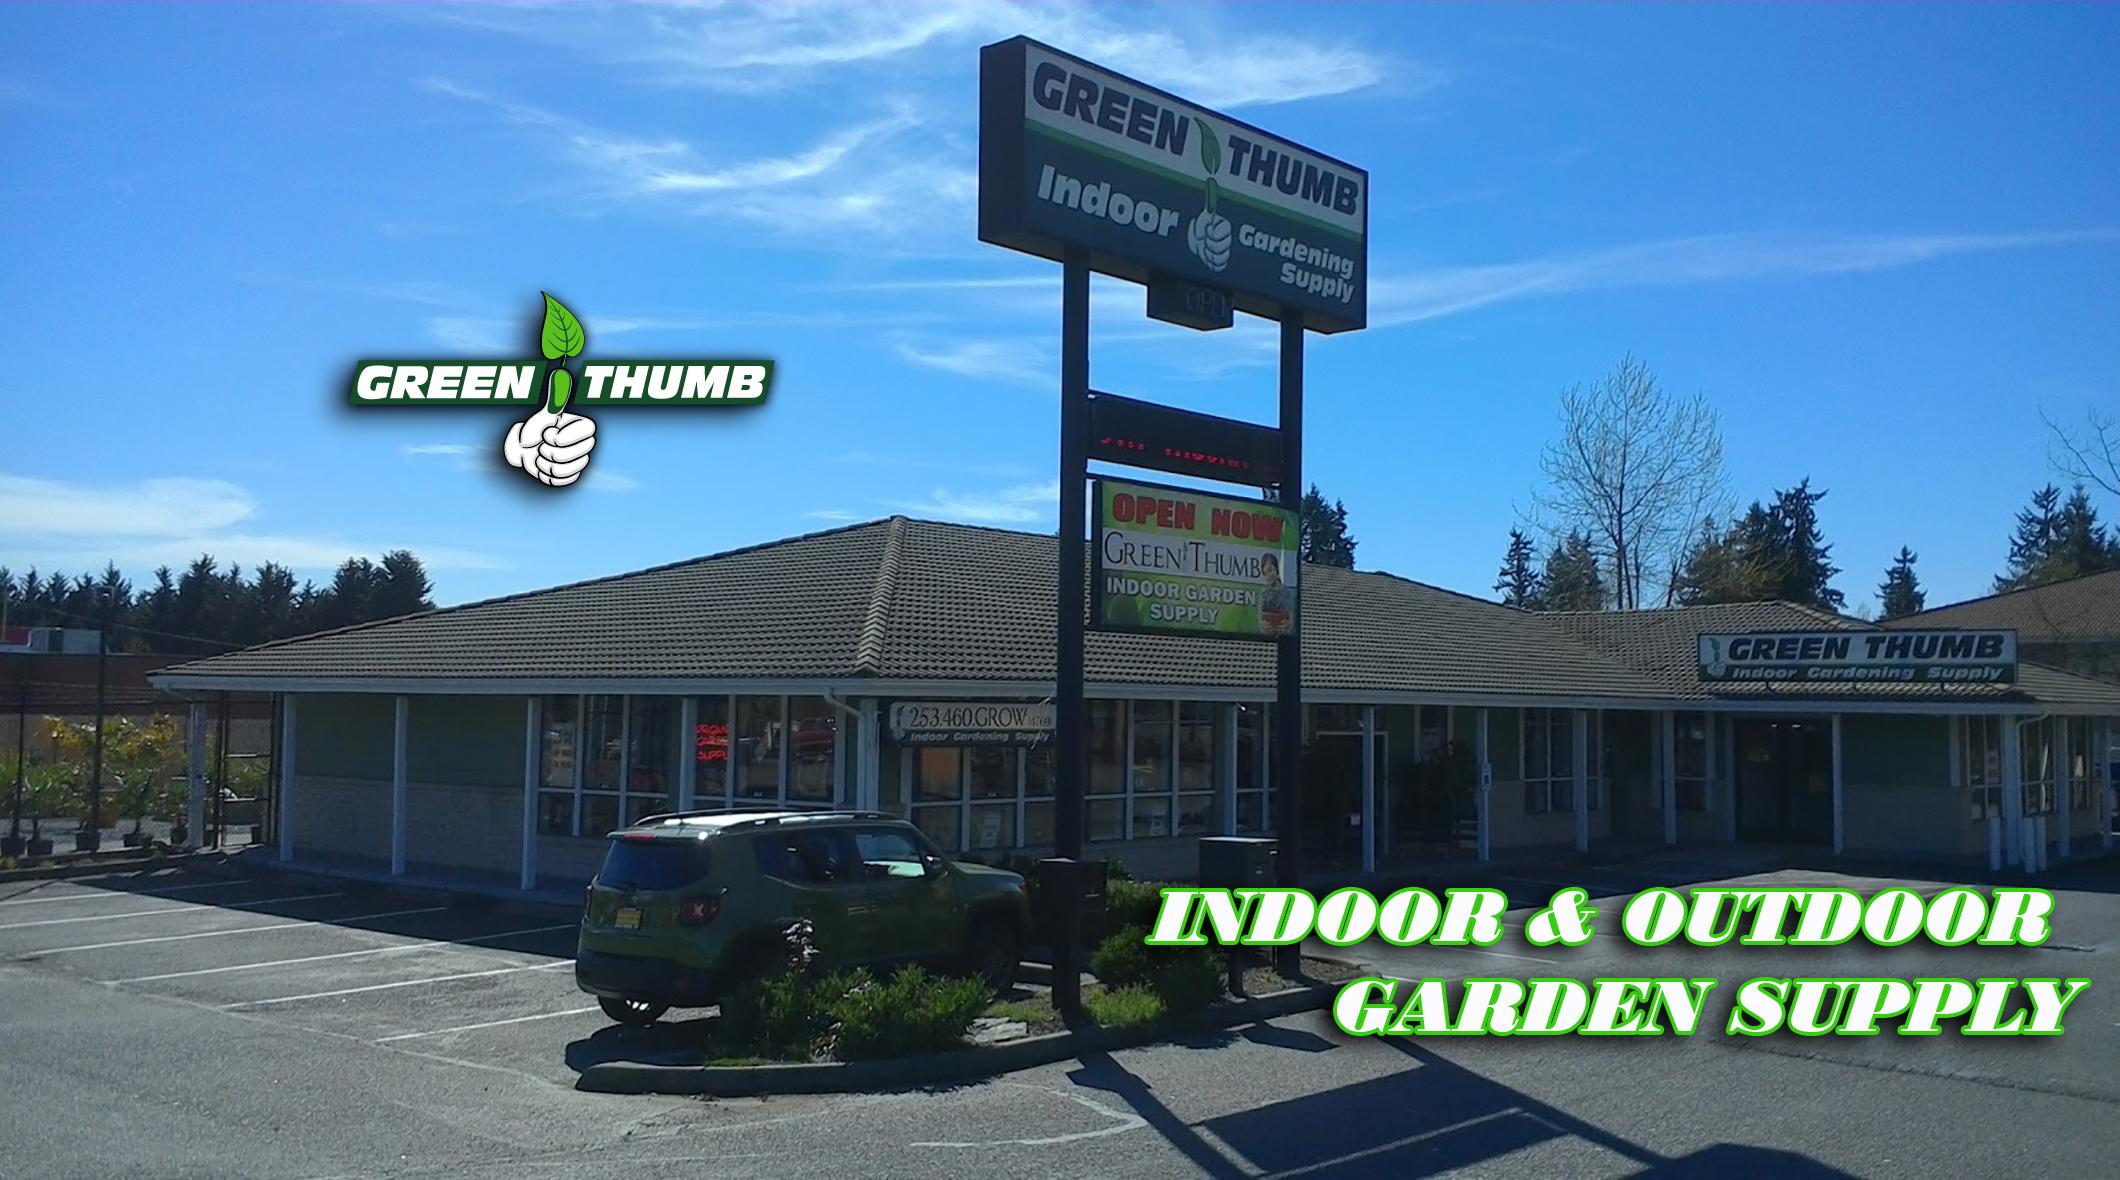 Genial Green Thumb Indoor Garden Supply 10120 128th Street Ct E, Puyallup, WA  98373   YP.com